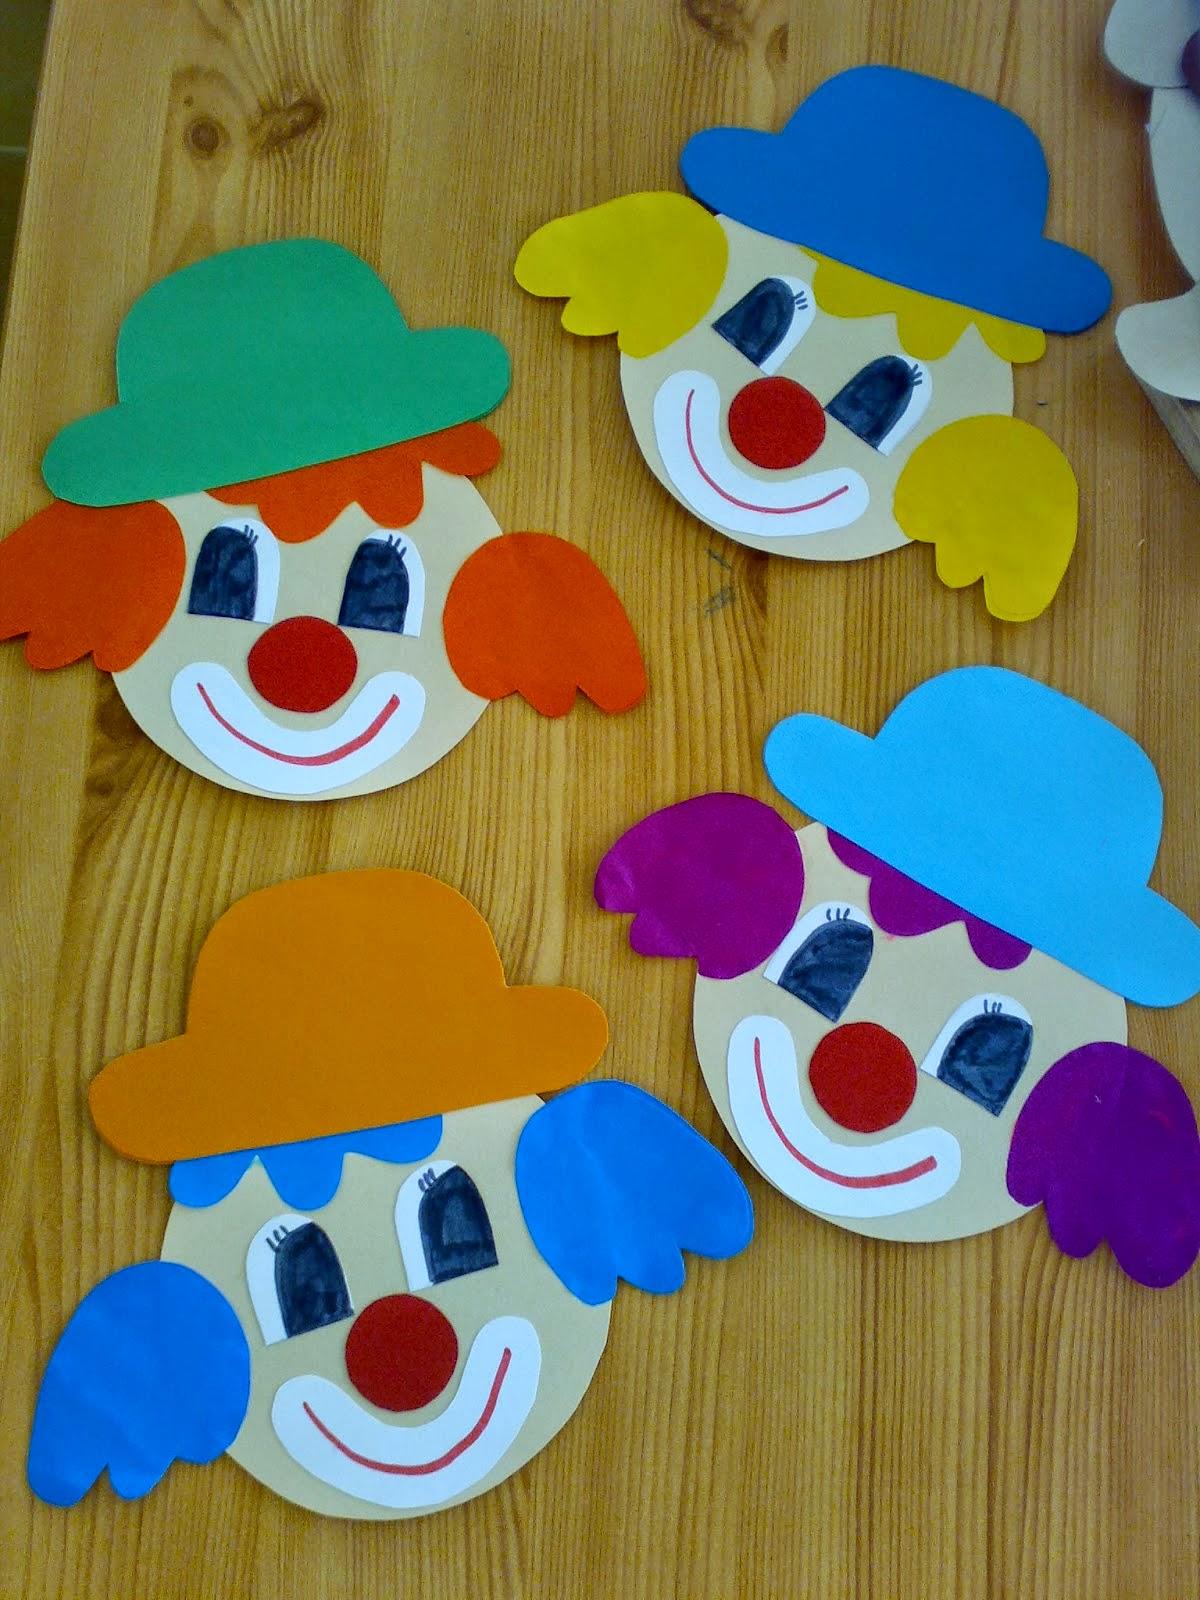 J t kos tanul s s kreativit s farsangra hangol dva boh cok - Fensterbilder karneval ...